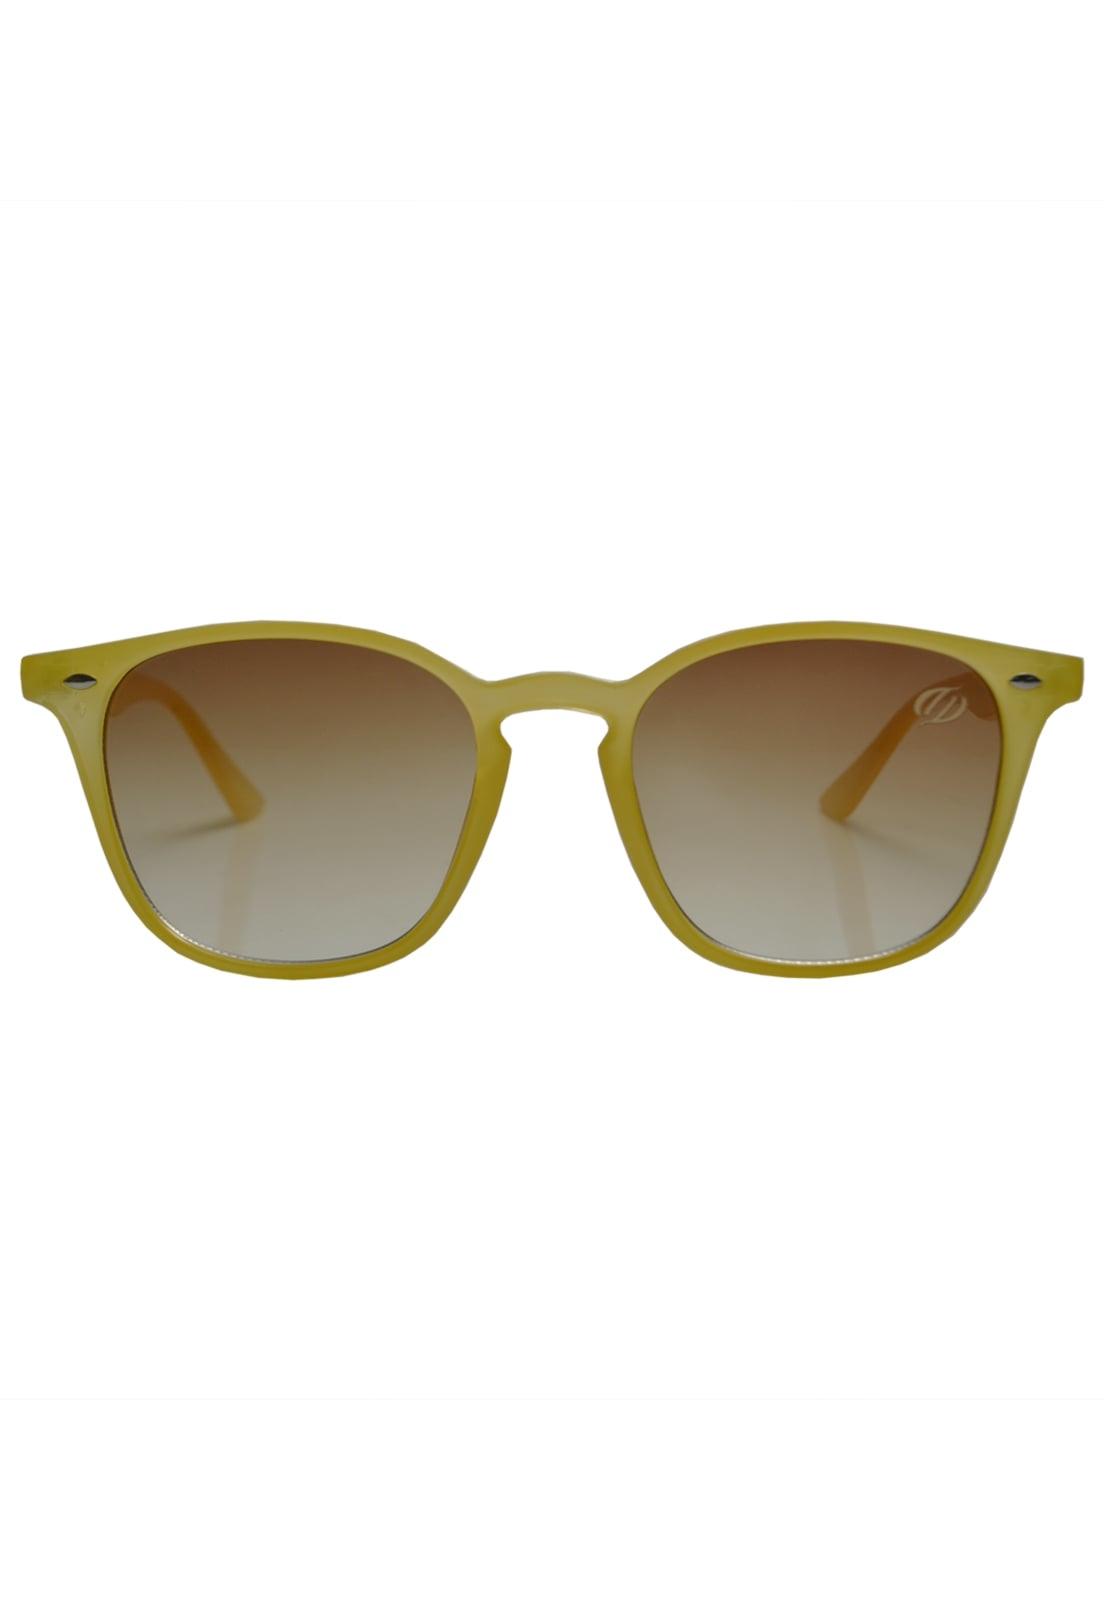 ÓCulos De Sol Tilit Unisex Acetato Quadrado Wayfarer - Amarelo